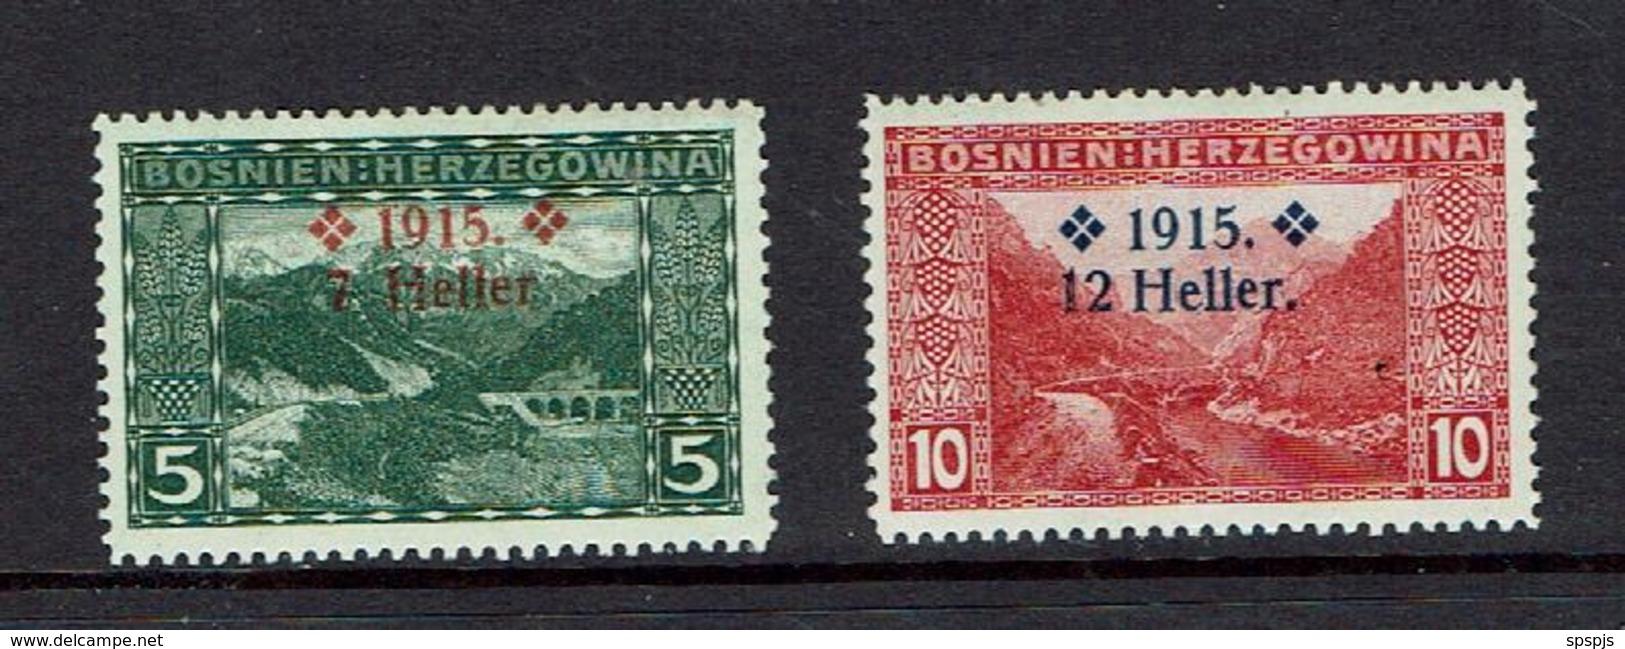 BOSNIA AND HERZEGOVINA....mh...1915 - Bosnia And Herzegovina